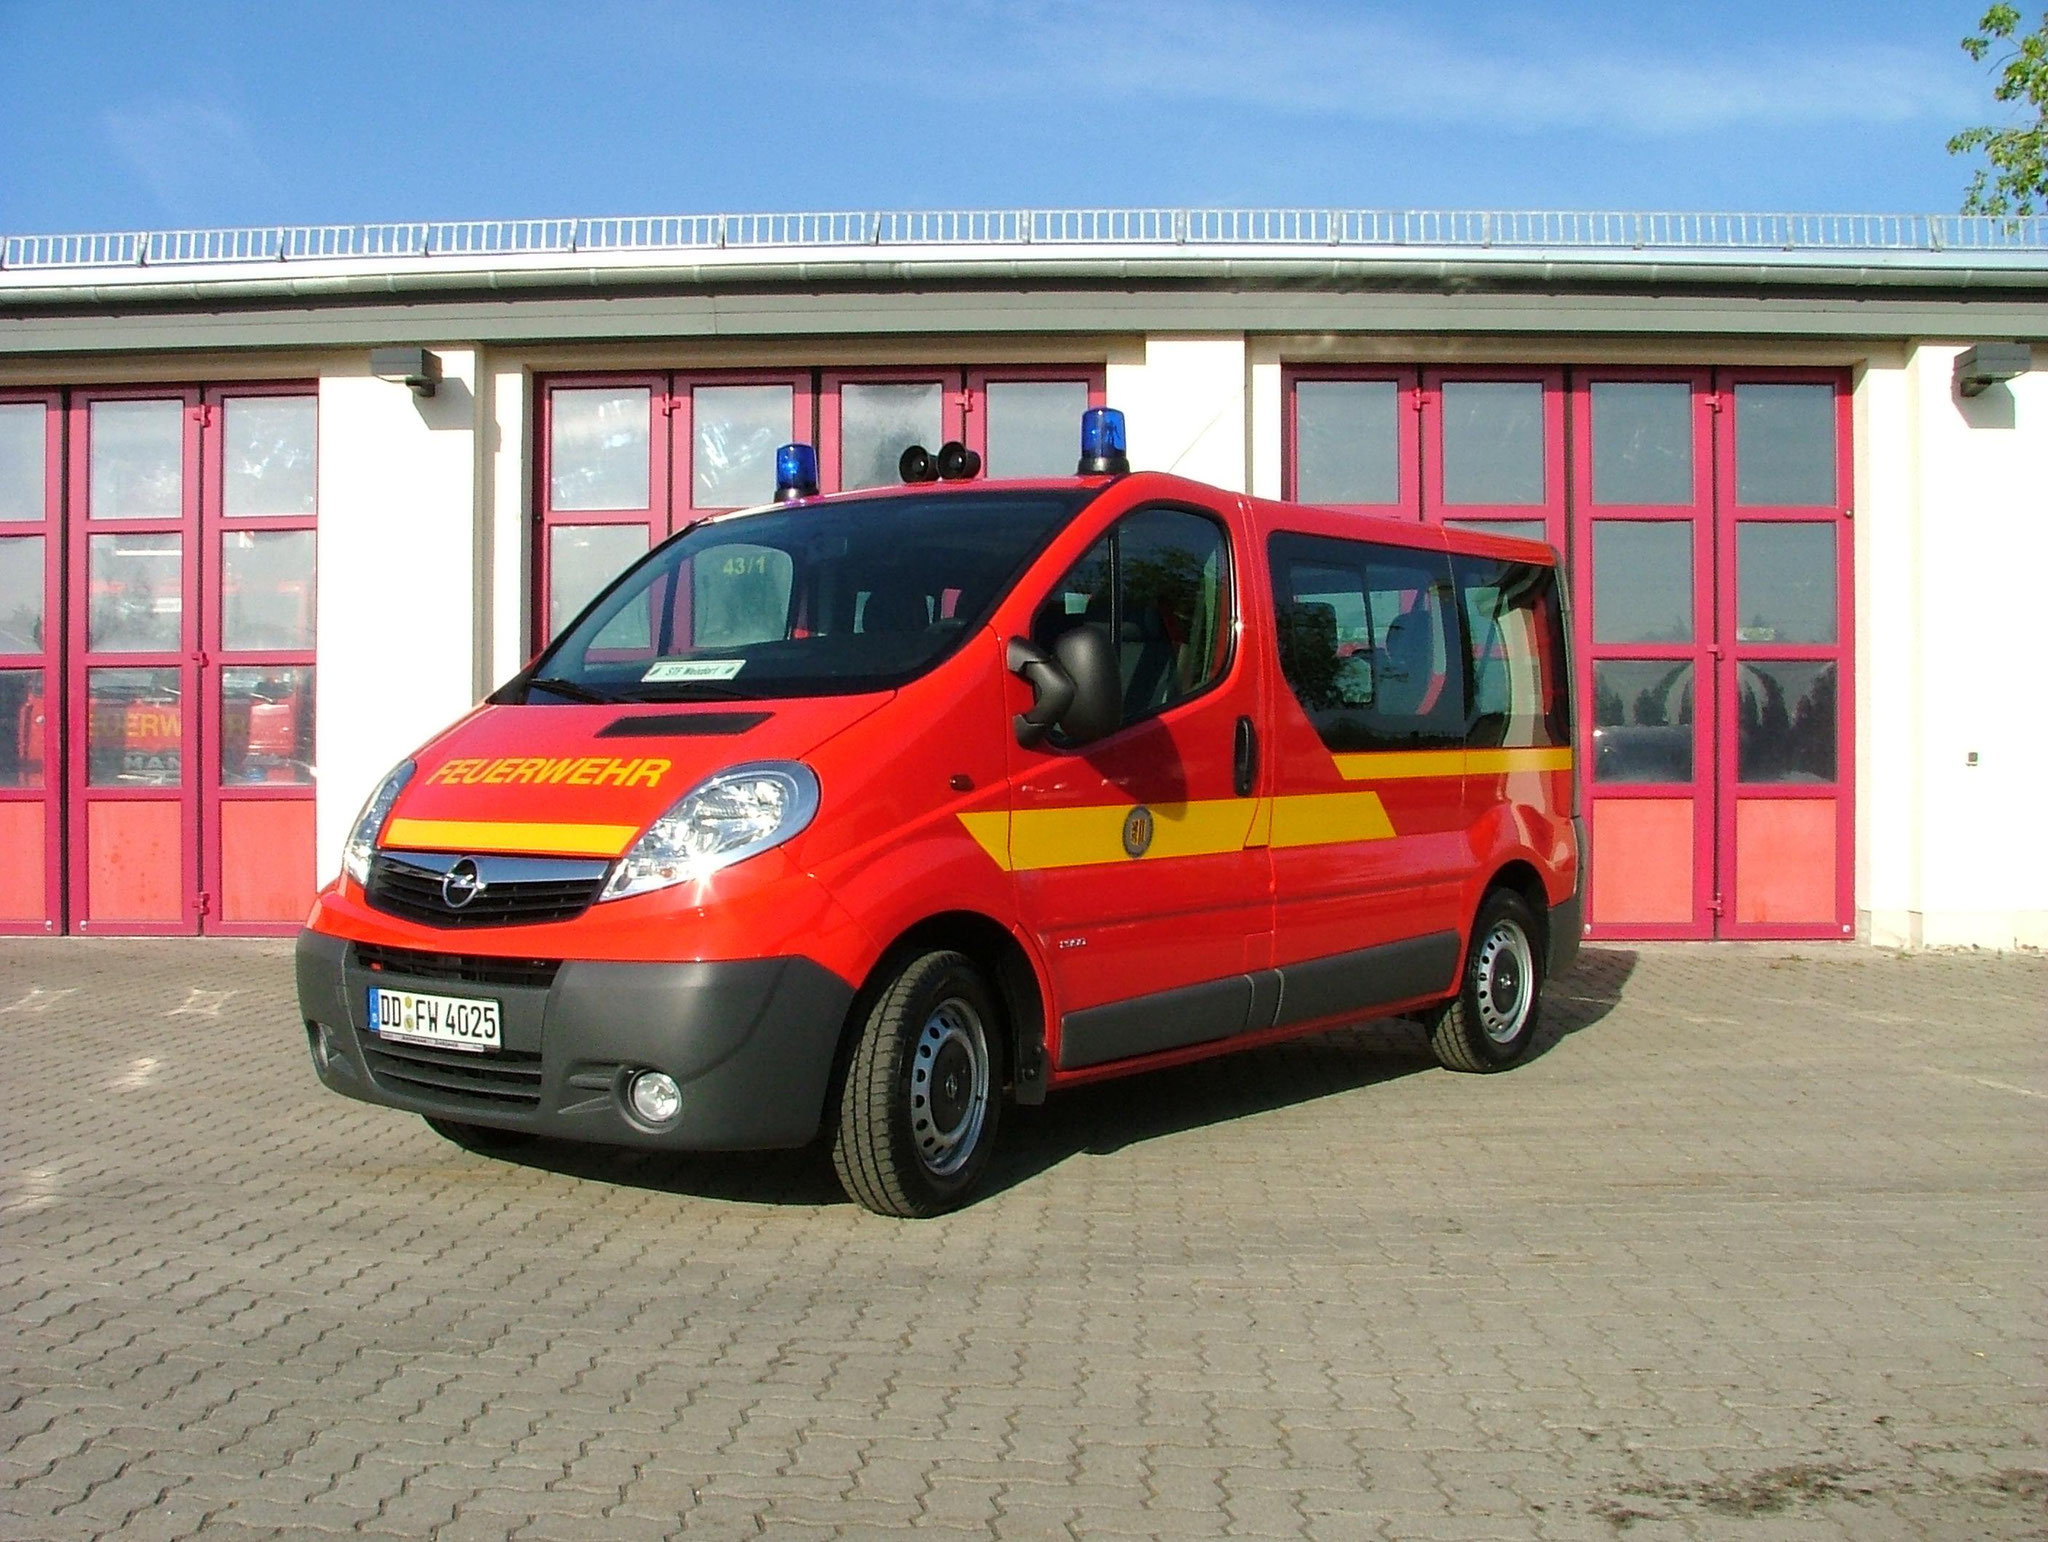 MTF     (Mannschaftstransportfahrzeug)